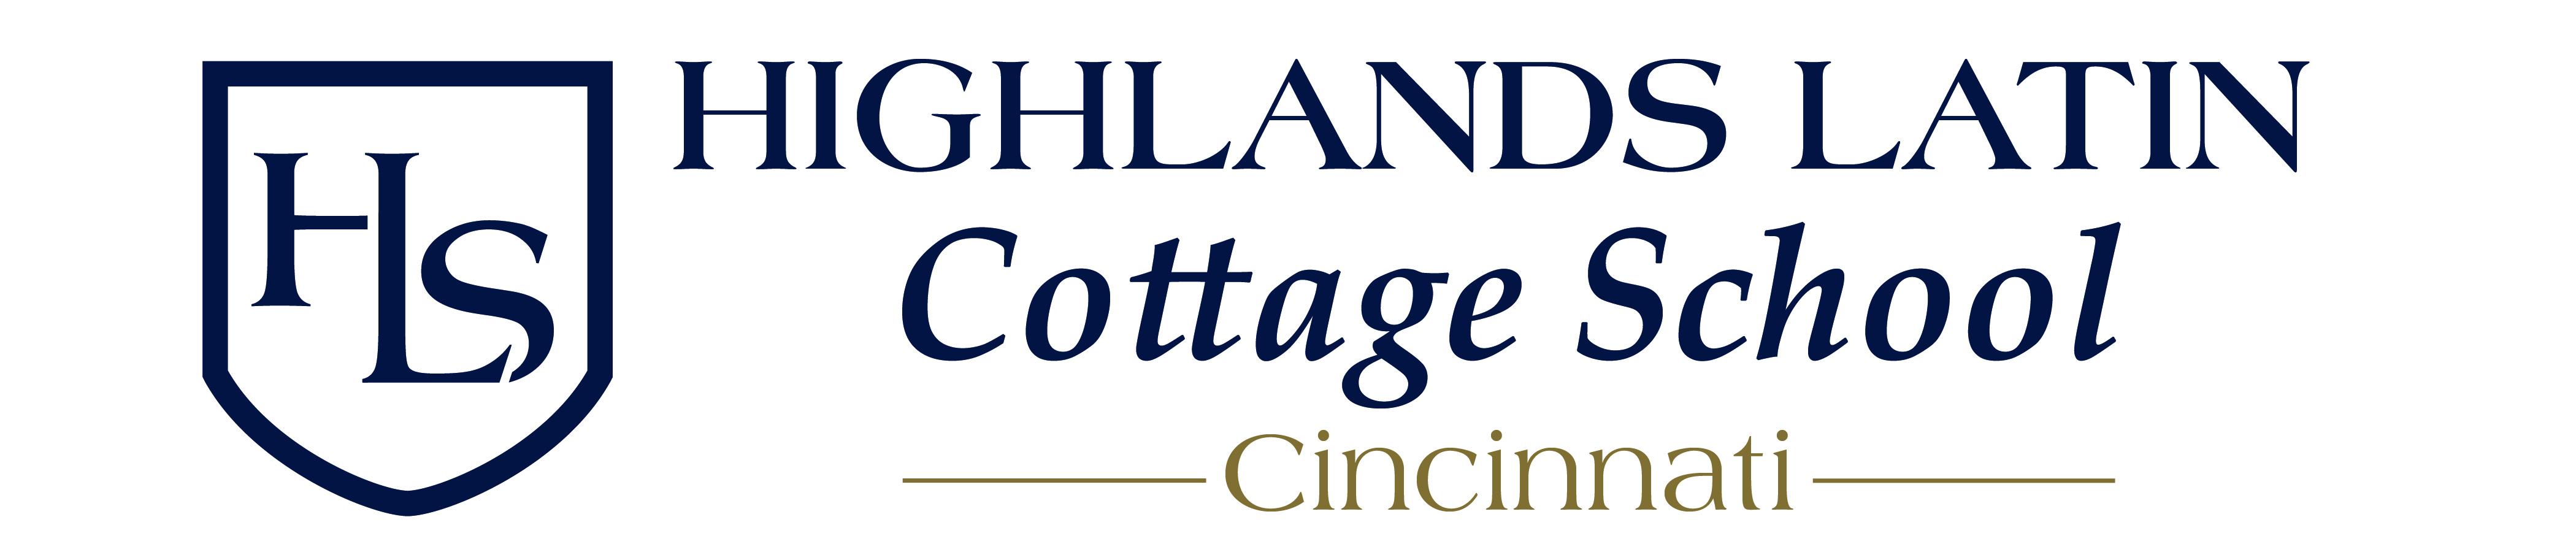 Highlands Latin Cincinnati